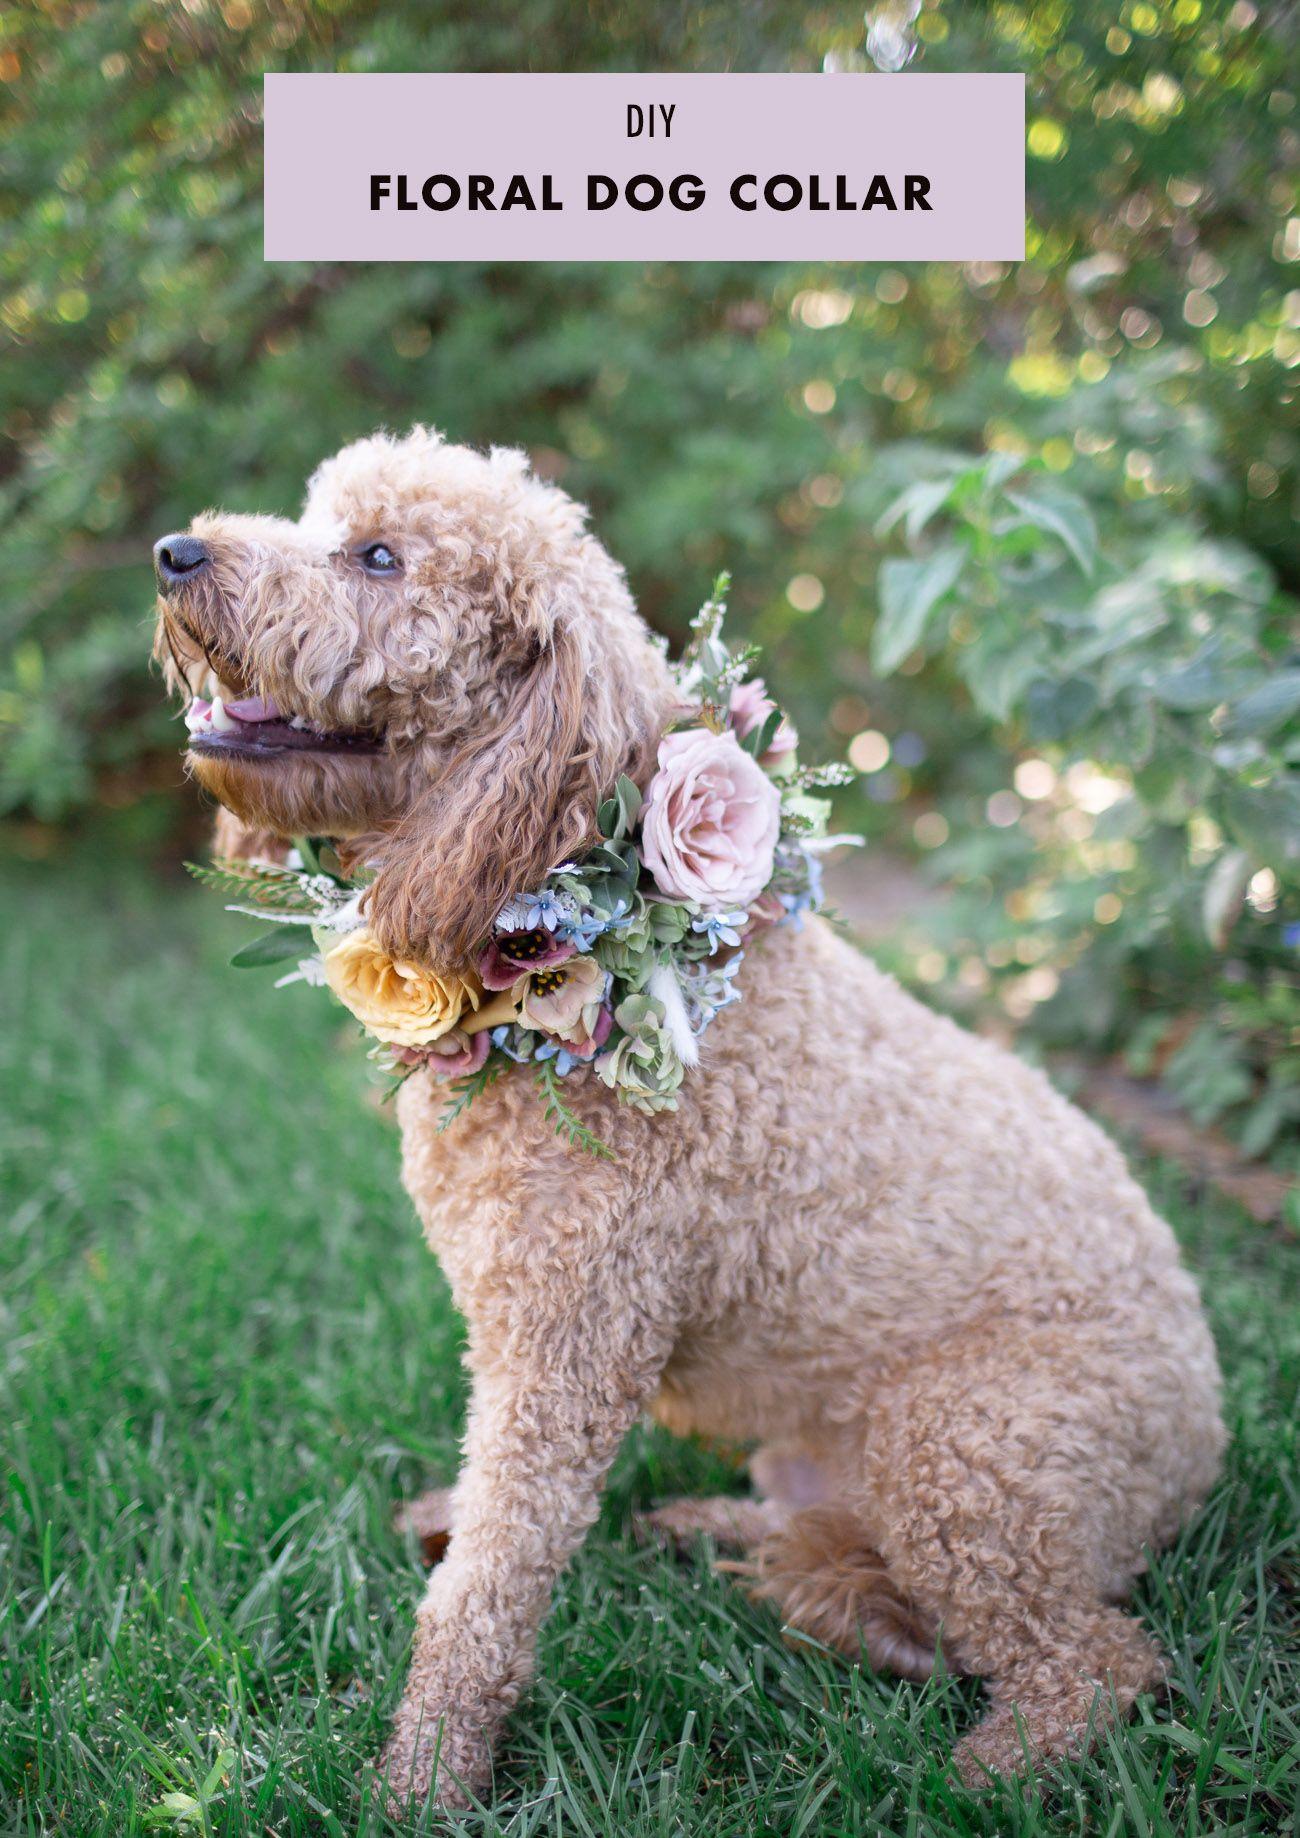 Diy floral dog collar green wedding shoes floral dog